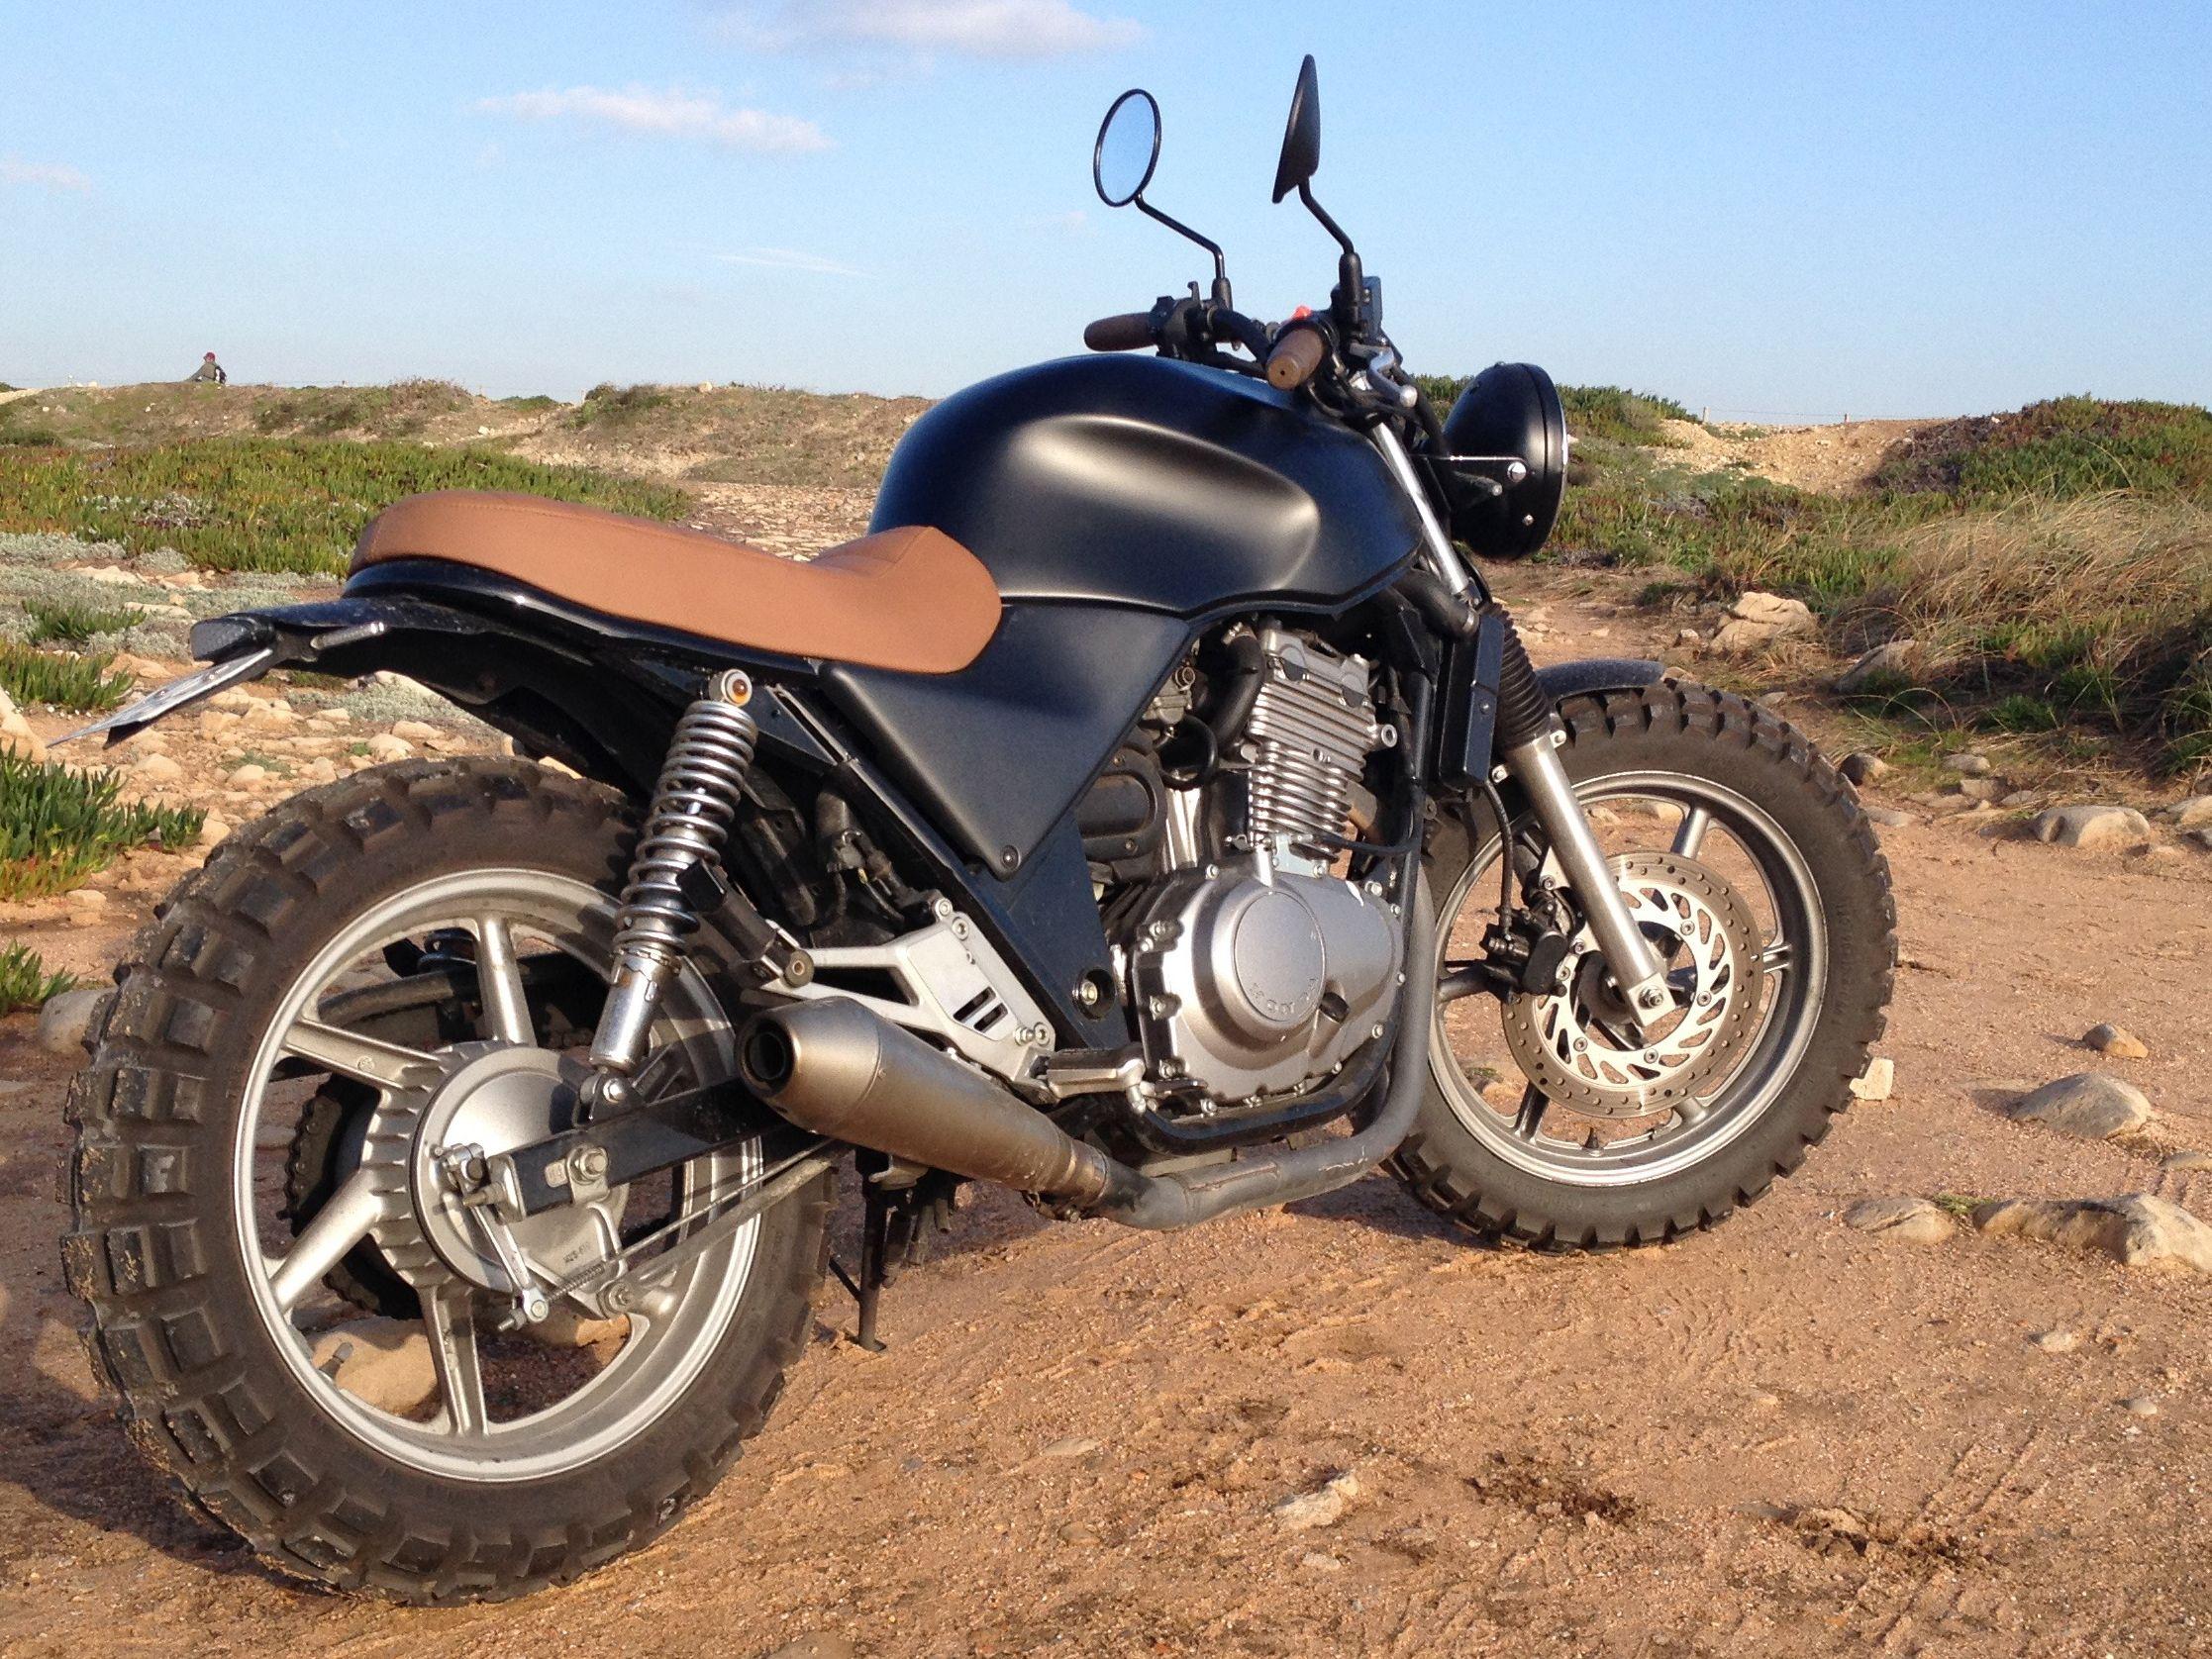 cb 500 scrambler motocikli motos motocicletas motos. Black Bedroom Furniture Sets. Home Design Ideas